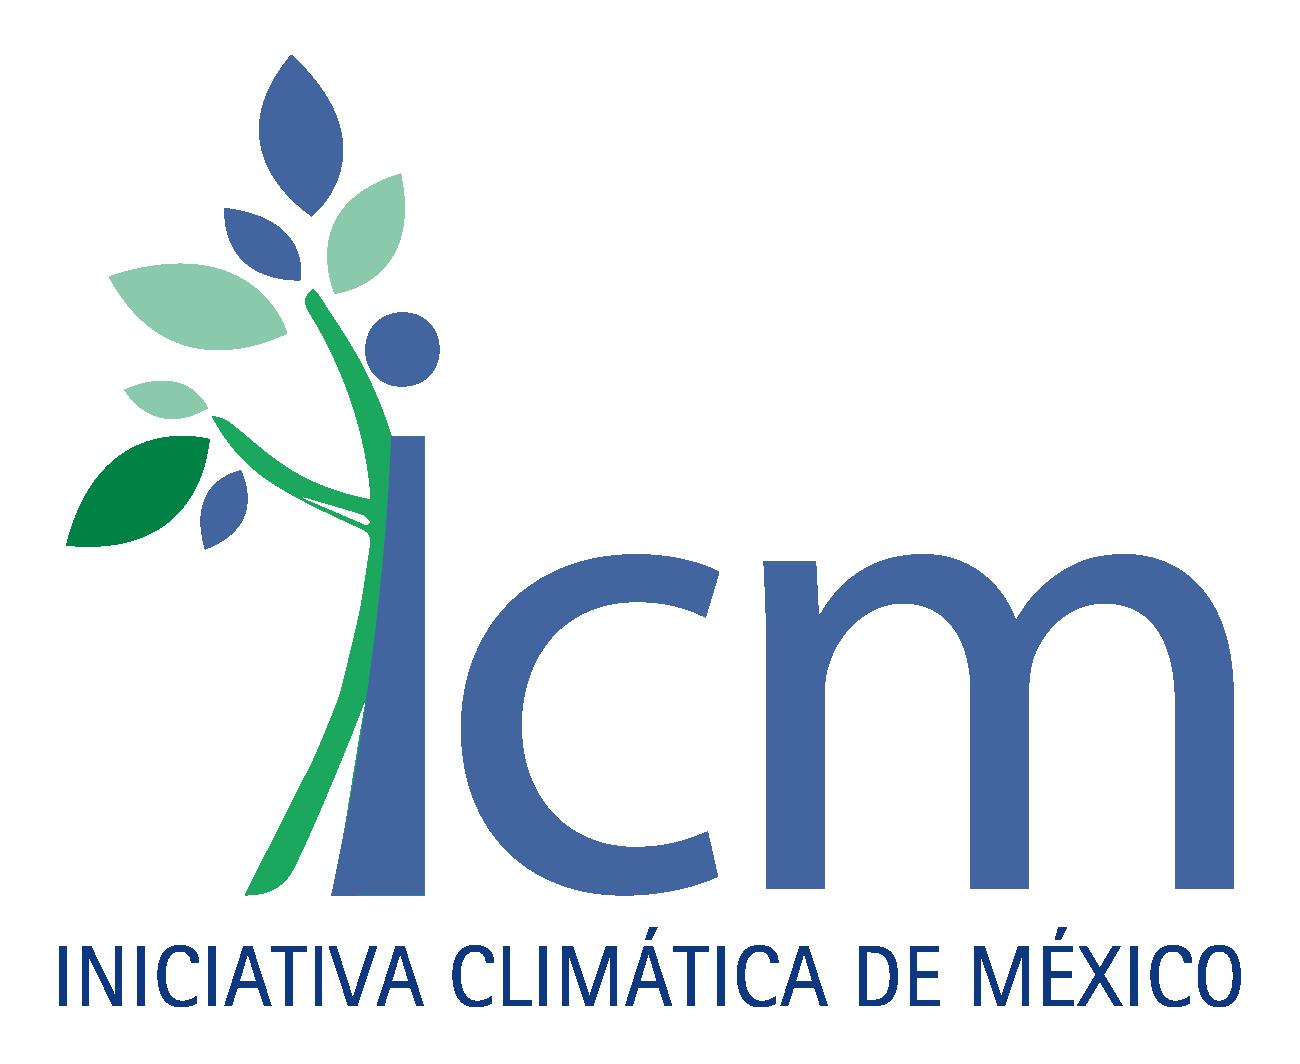 Iniciativa Climatica de Mexico